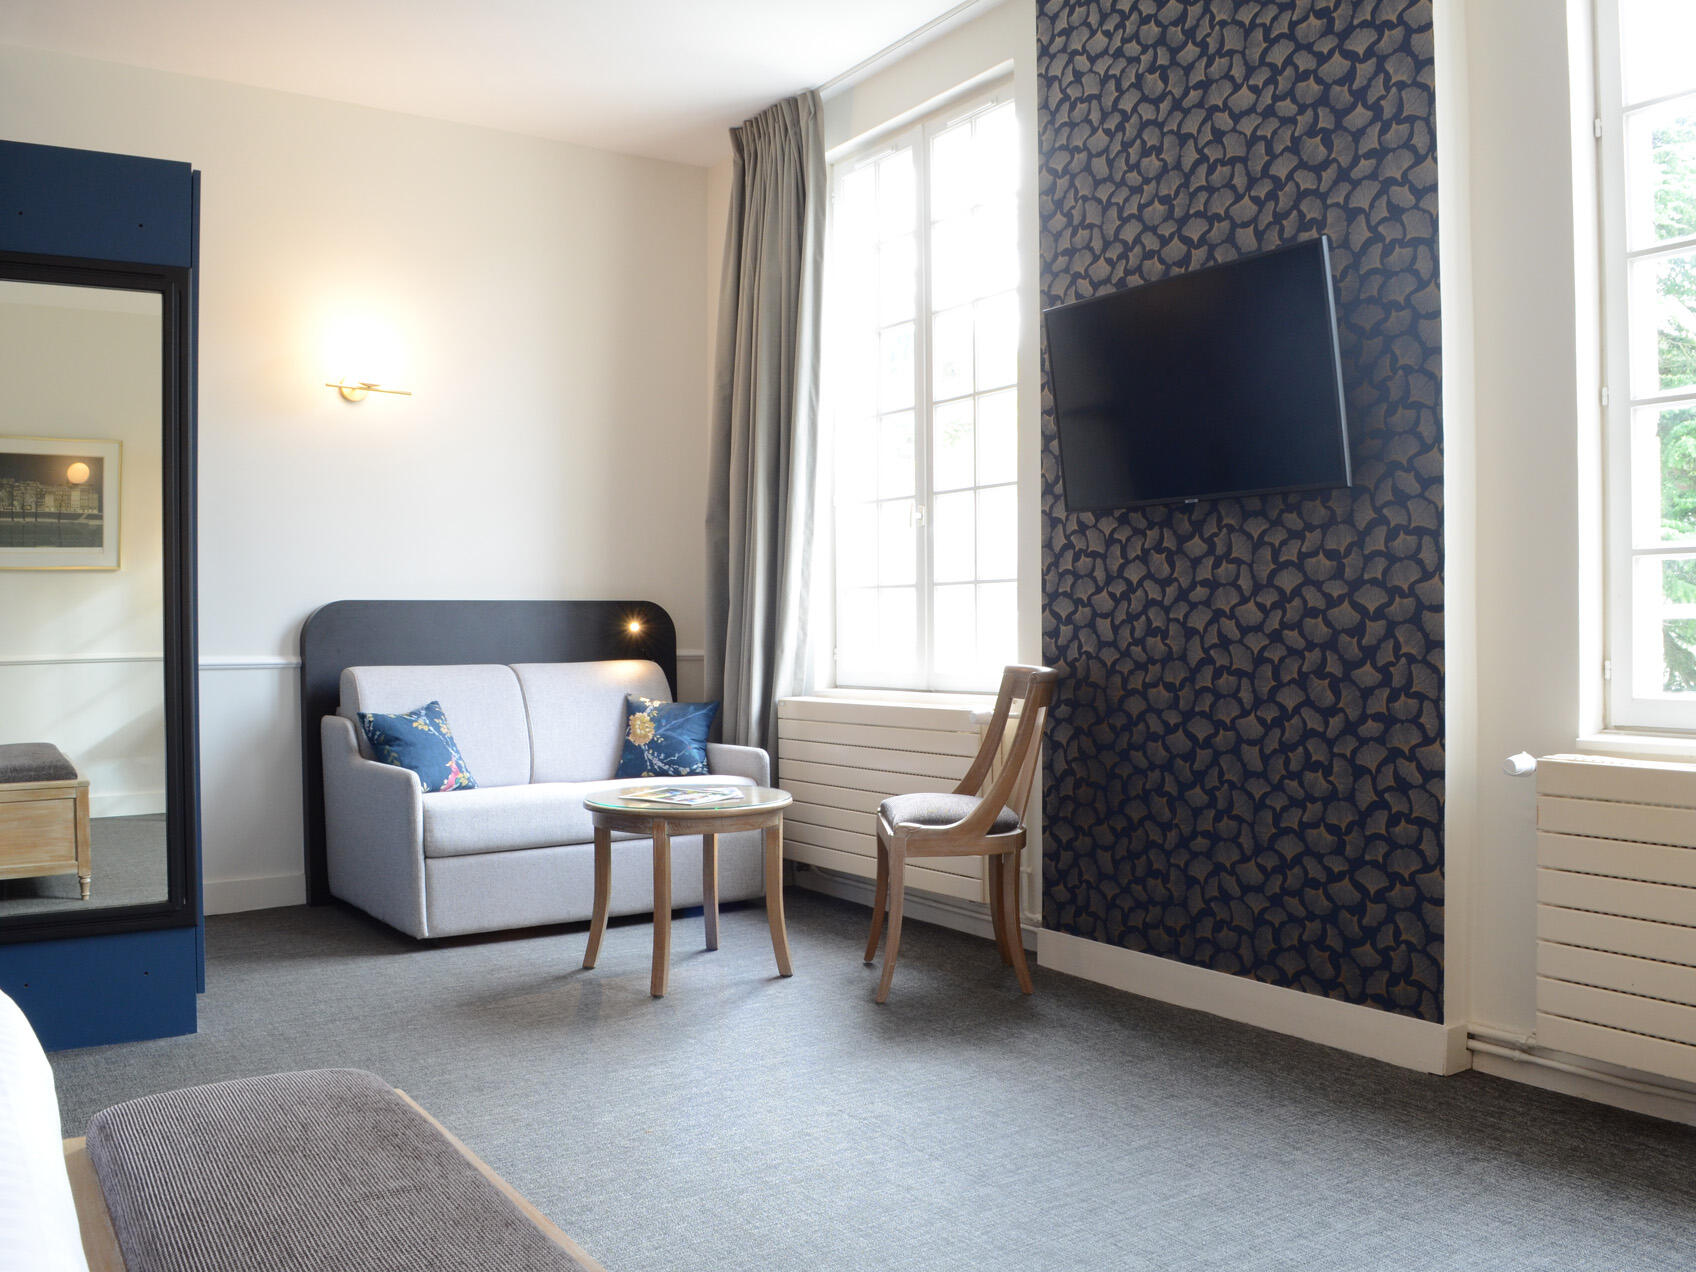 Interior of Prestige Chateau chambre at The Originals Hotels